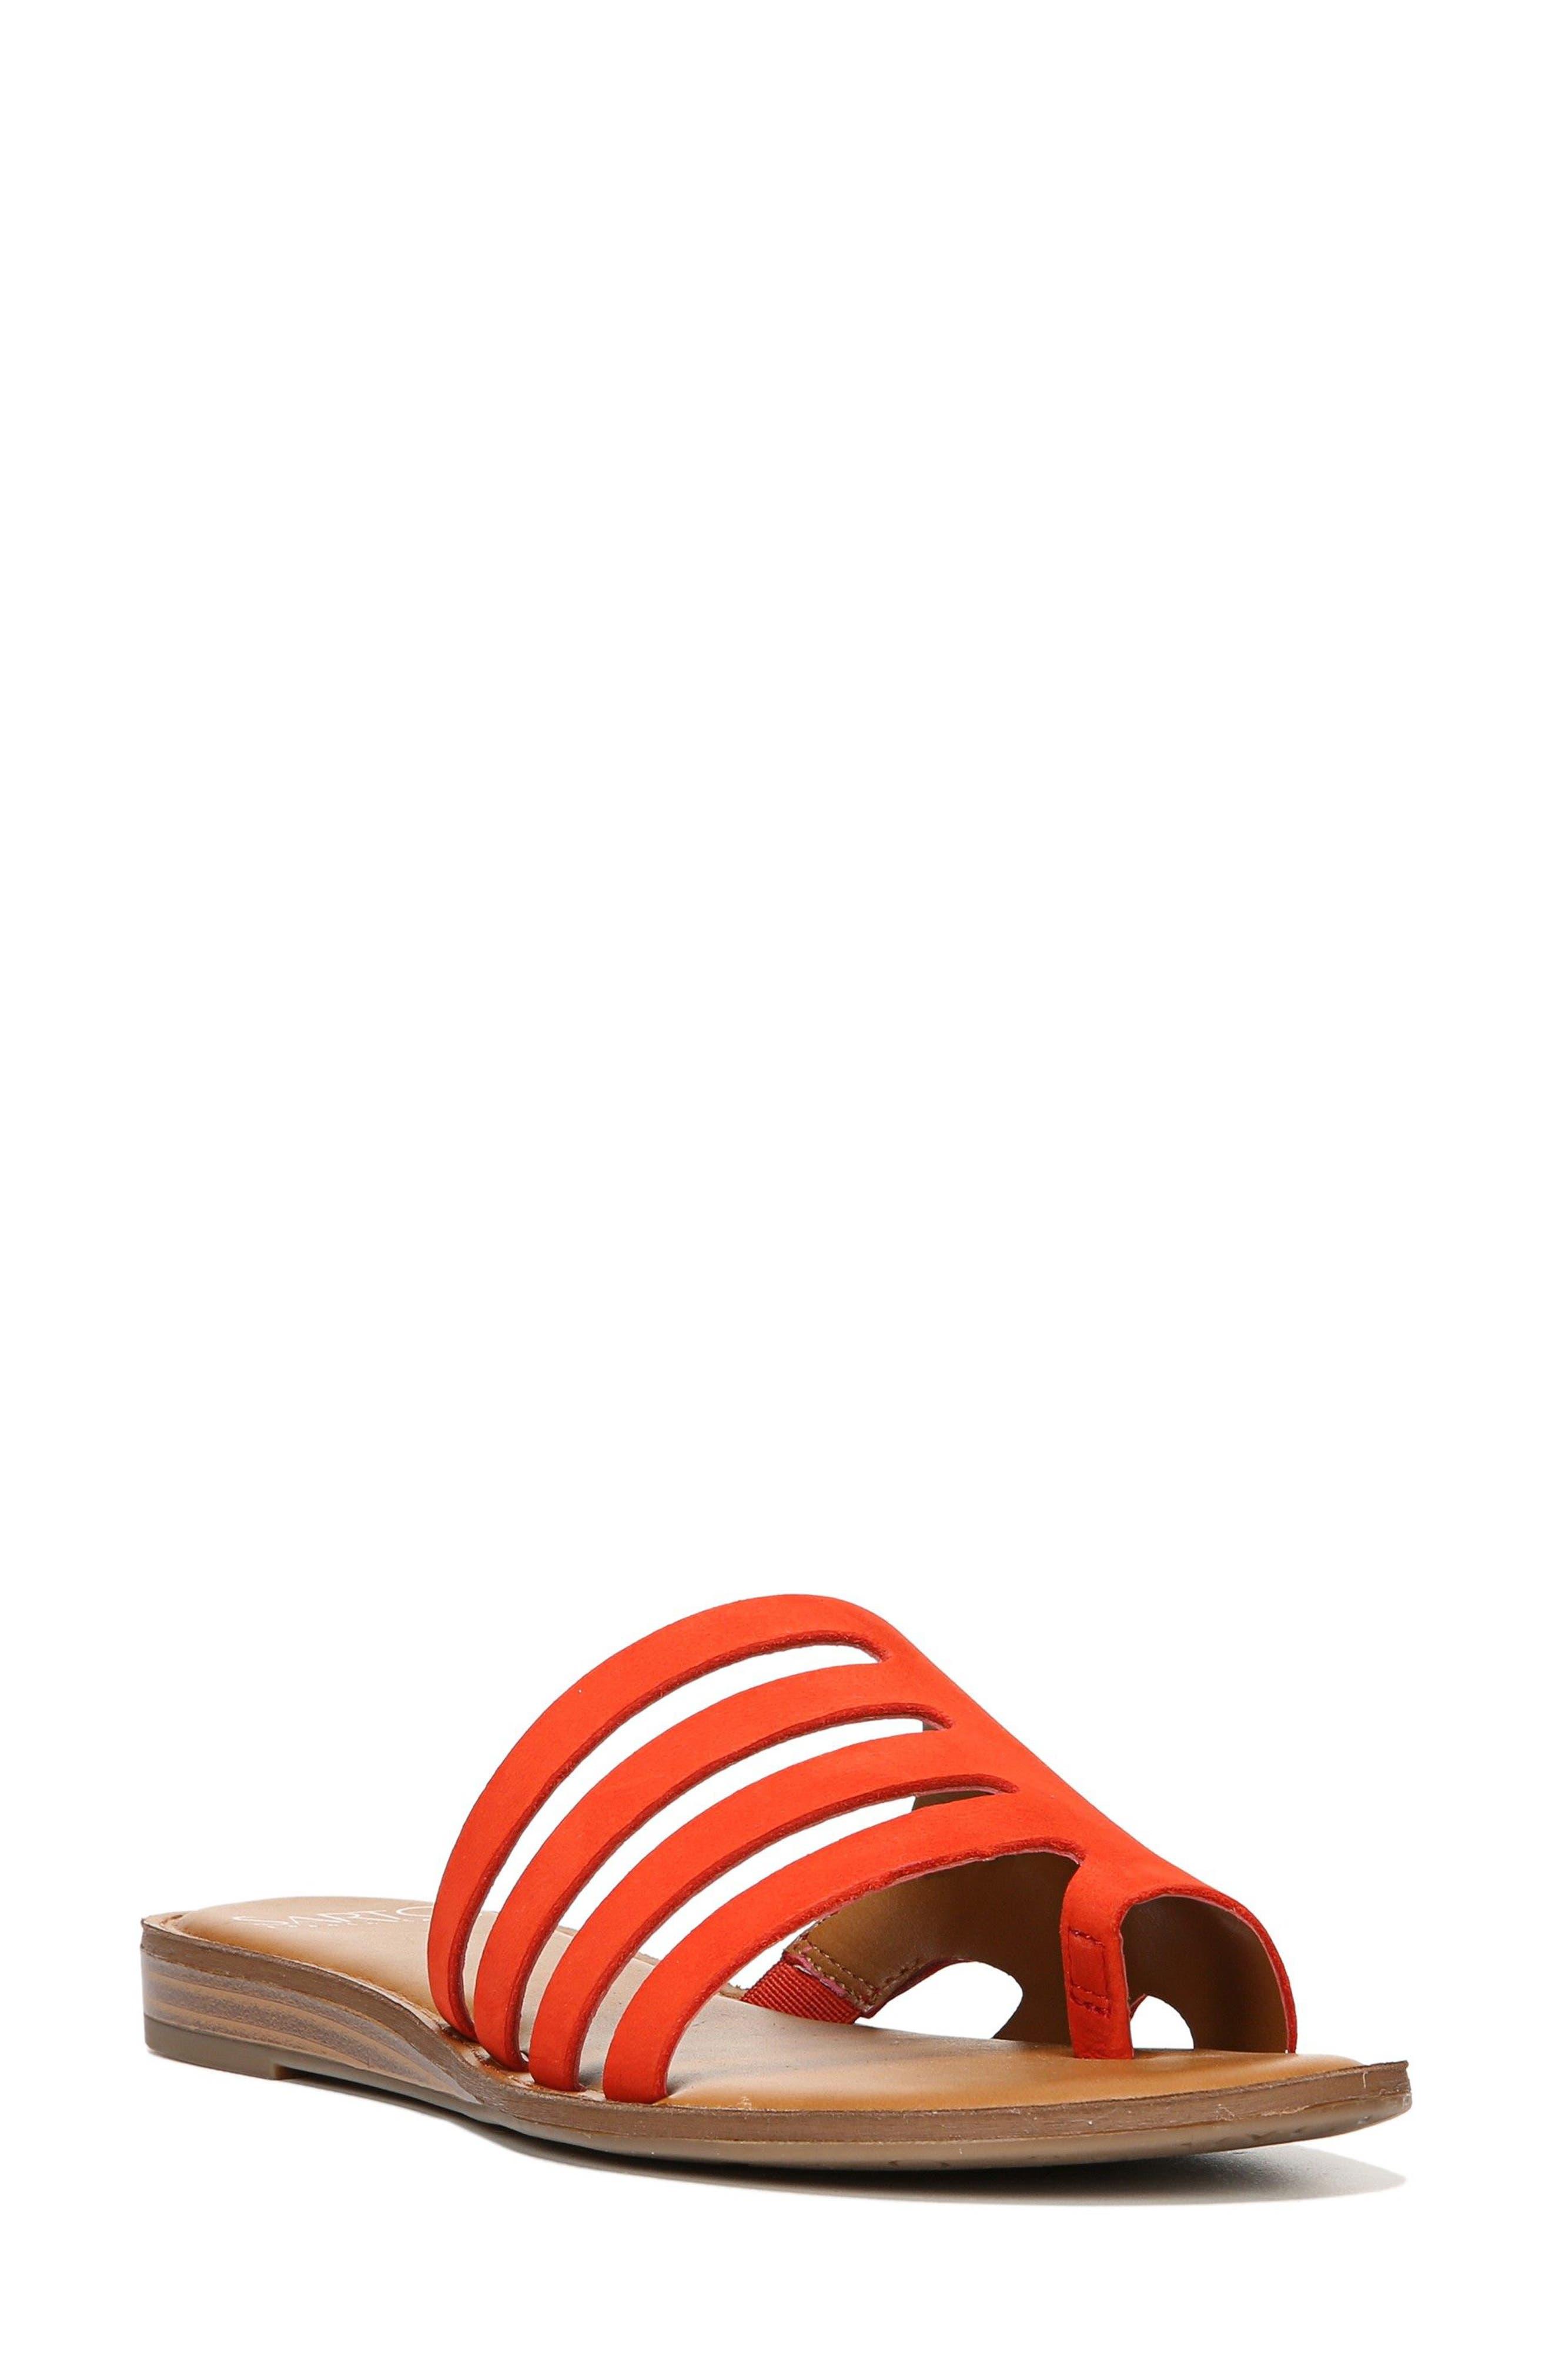 SARTO BY FRANCO SARTO Gala Slide Sandal